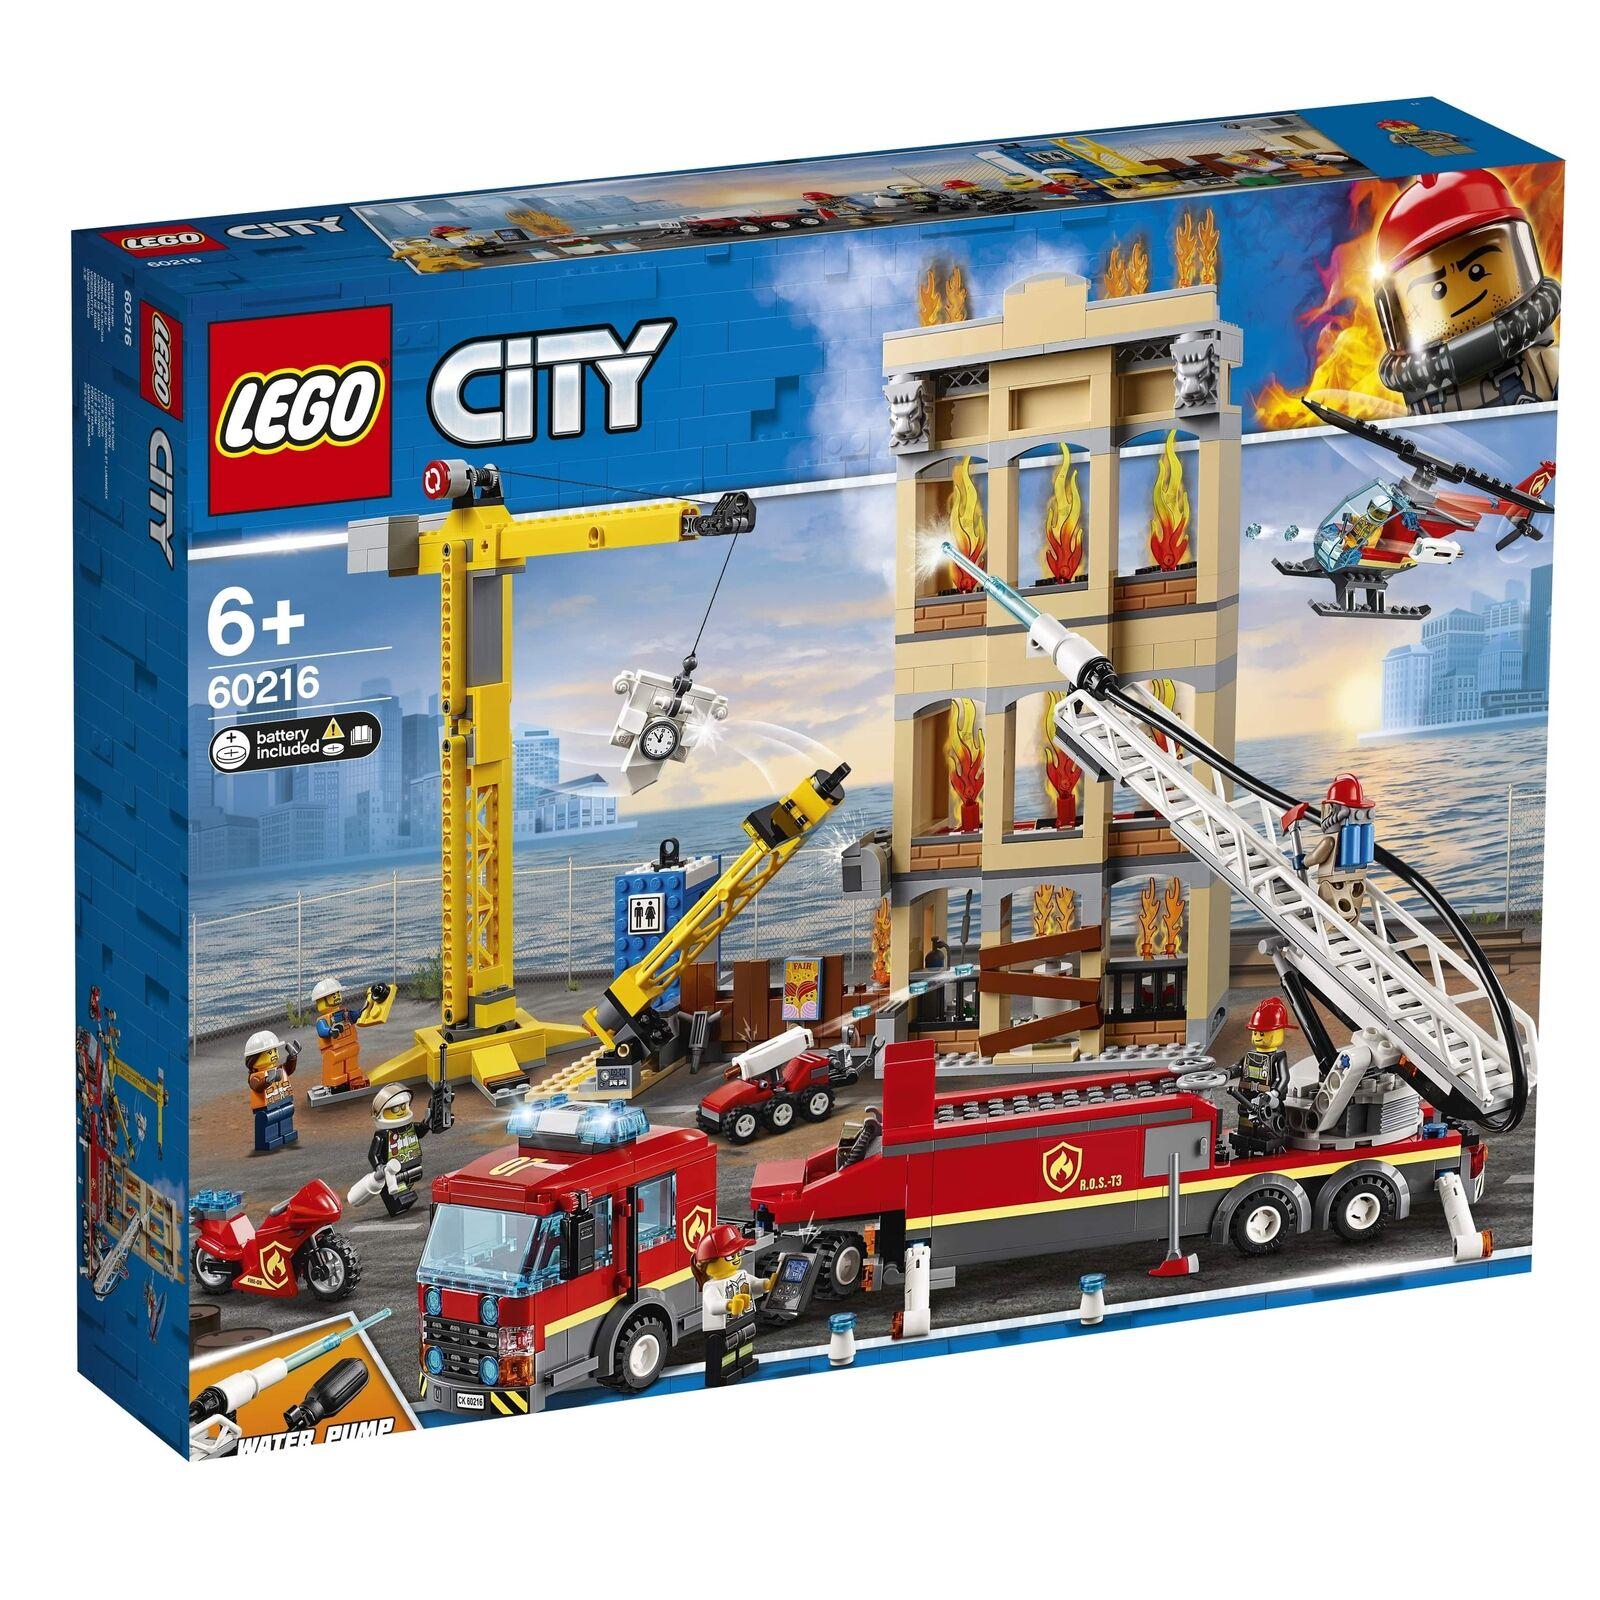 Lego Downtown Cuerpo de Bomberos Set (60216)